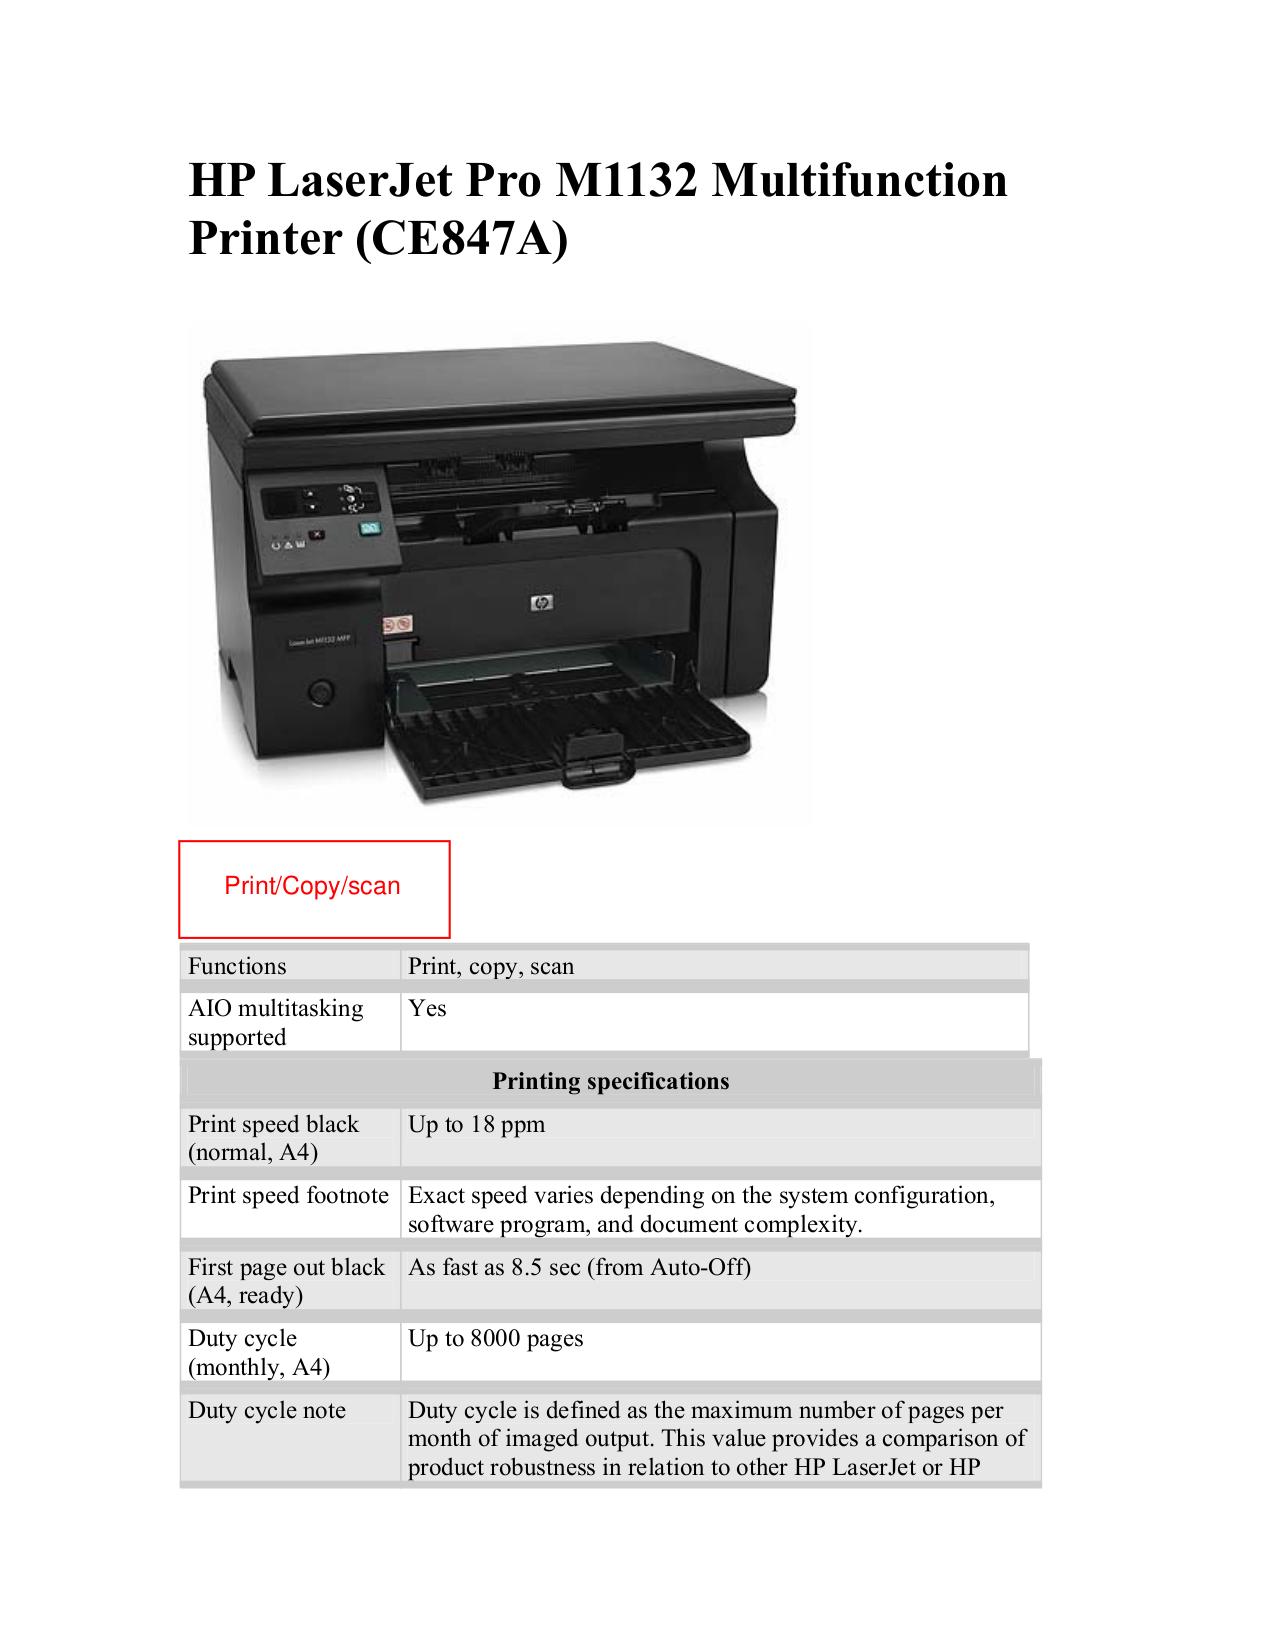 pdf for HP Multifunction Printer Laserjet,Color Laserjet Pro M1132 manual